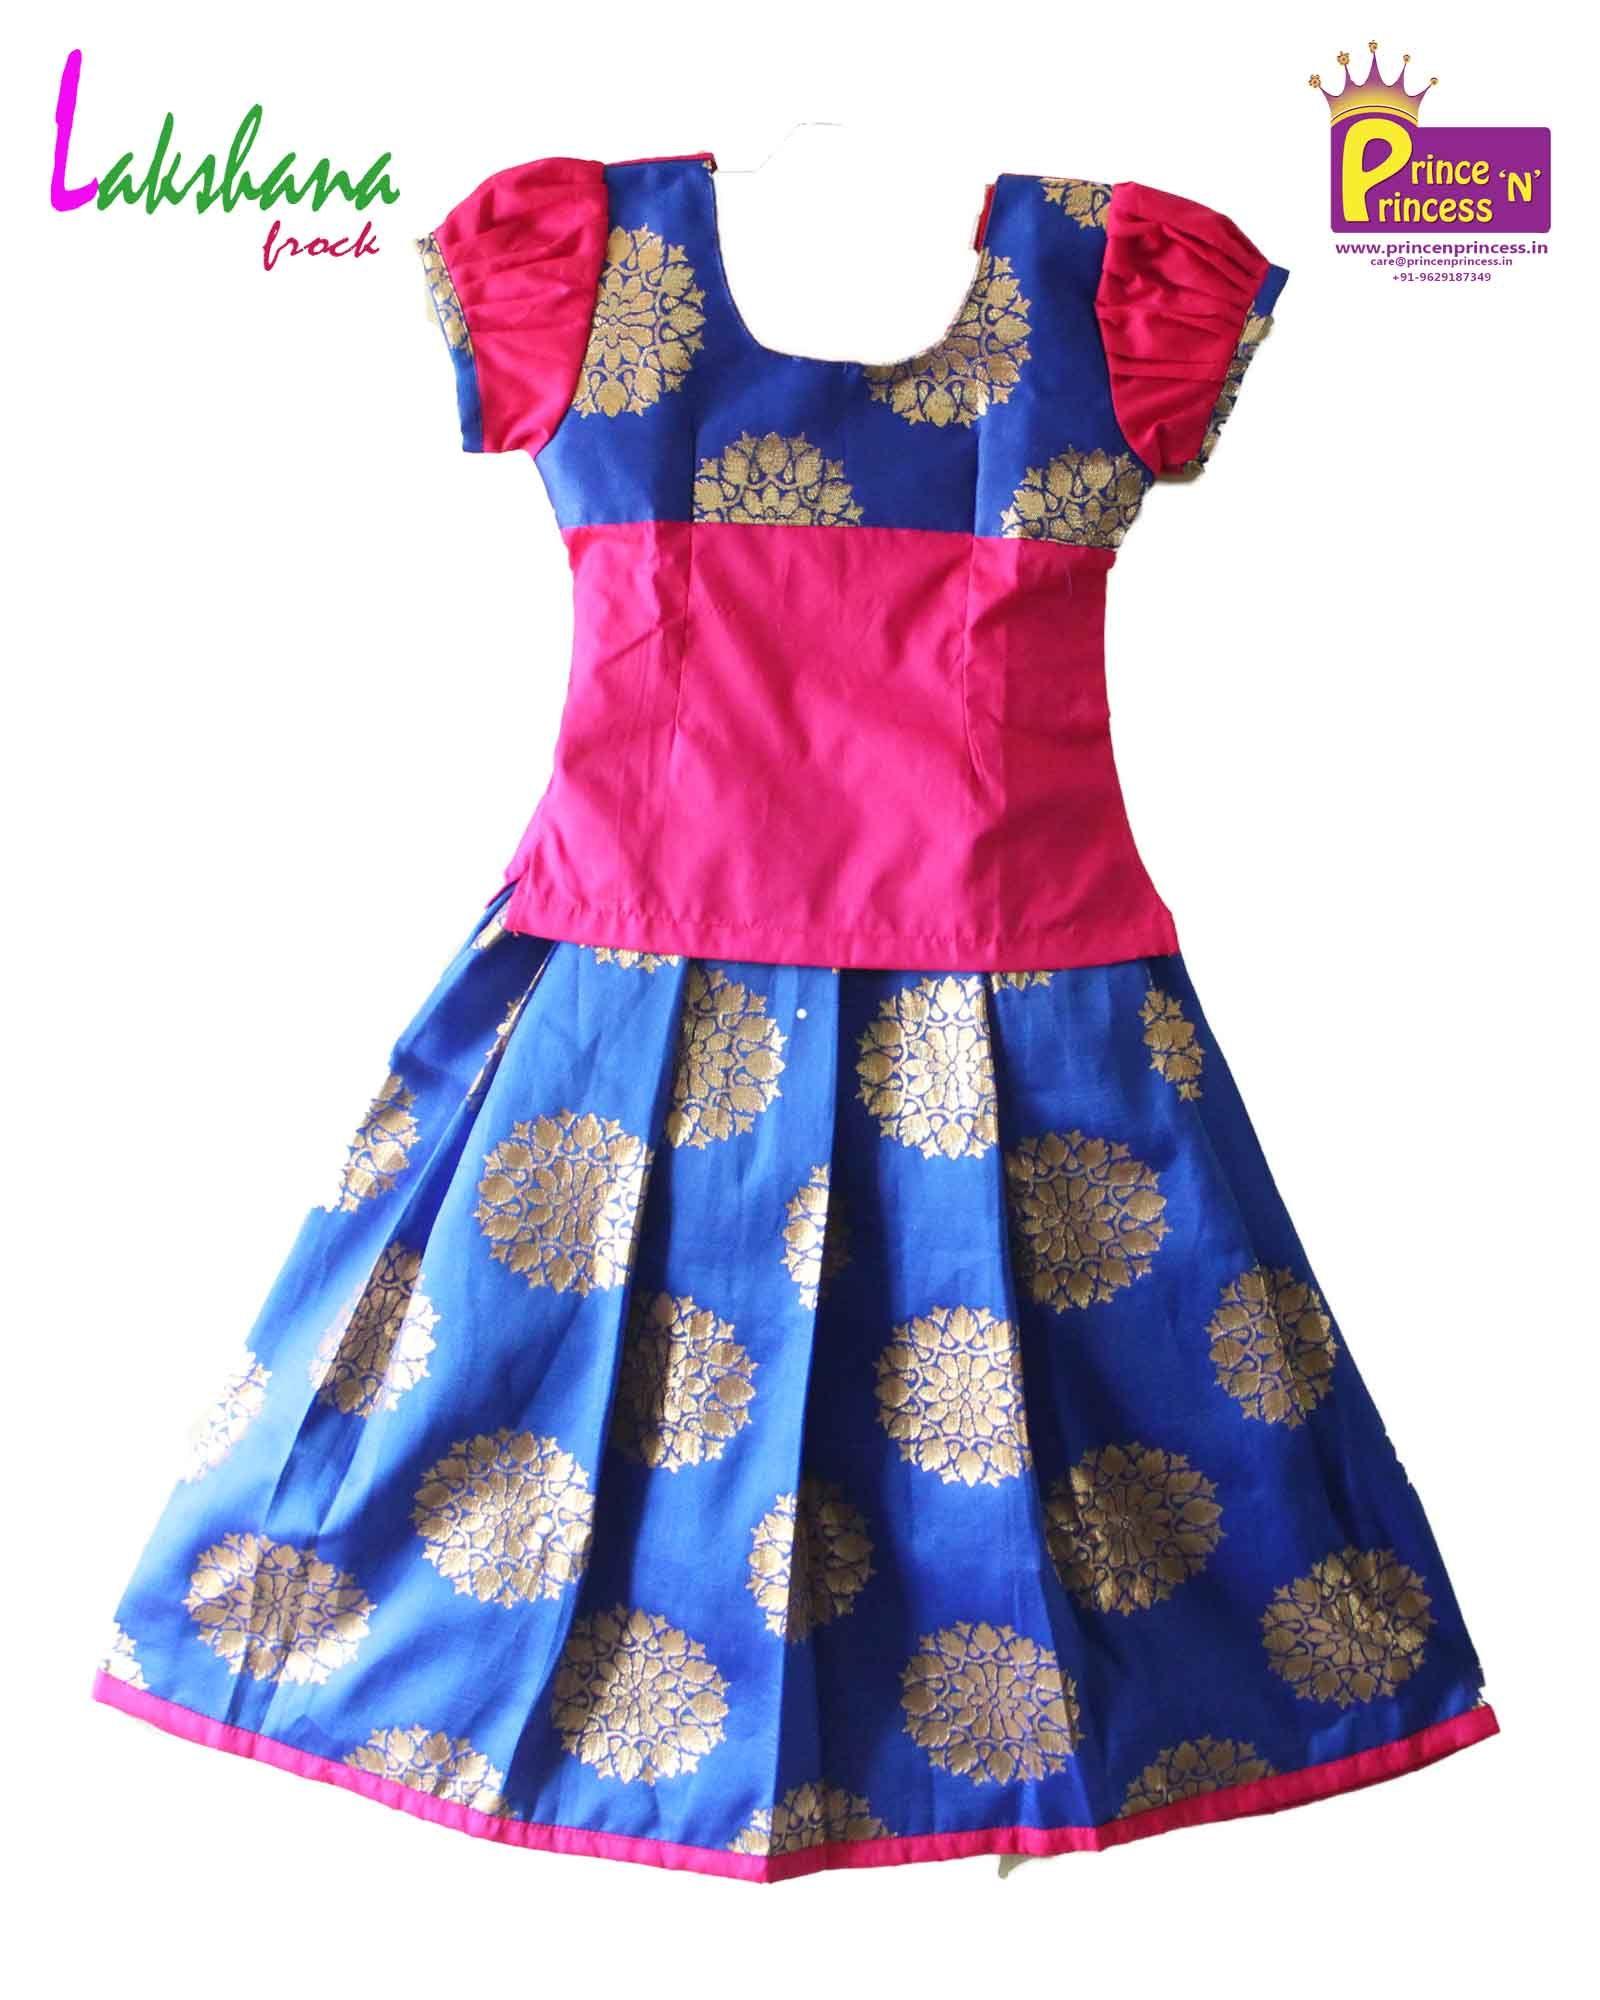 Designer Pattu Pavadai Grand Pavadai For Special Occasion Pattu Langa New Born Girls First Pattu La Kids Blouse Designs Kids Designer Dresses Kids Frocks